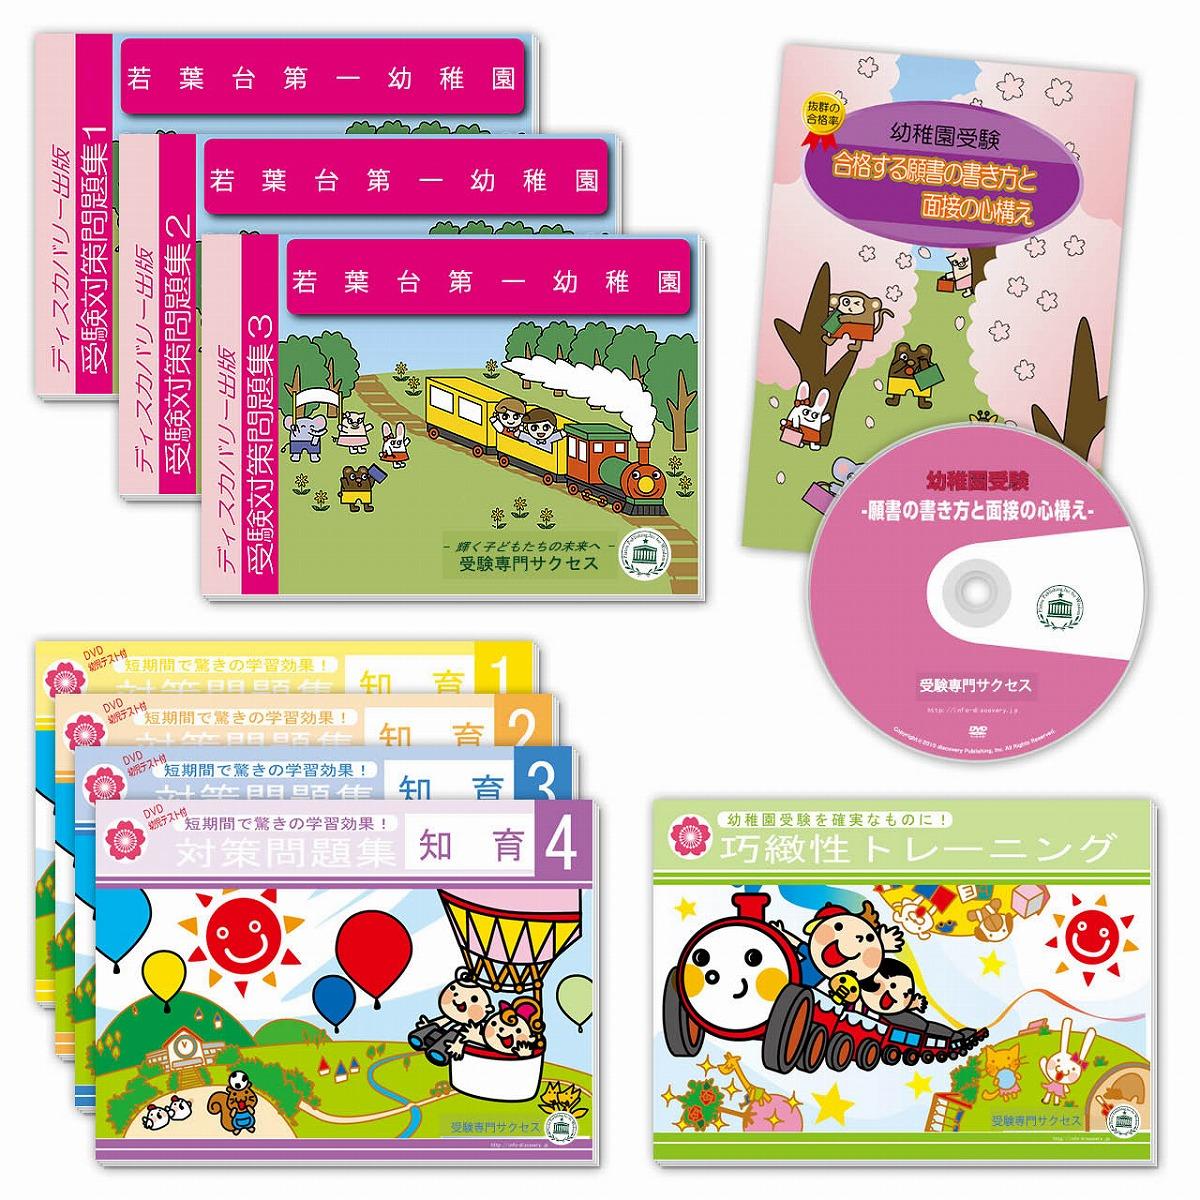 【送料・代引手数料無料】若葉台第一幼稚園・合格セット+補助教材セット